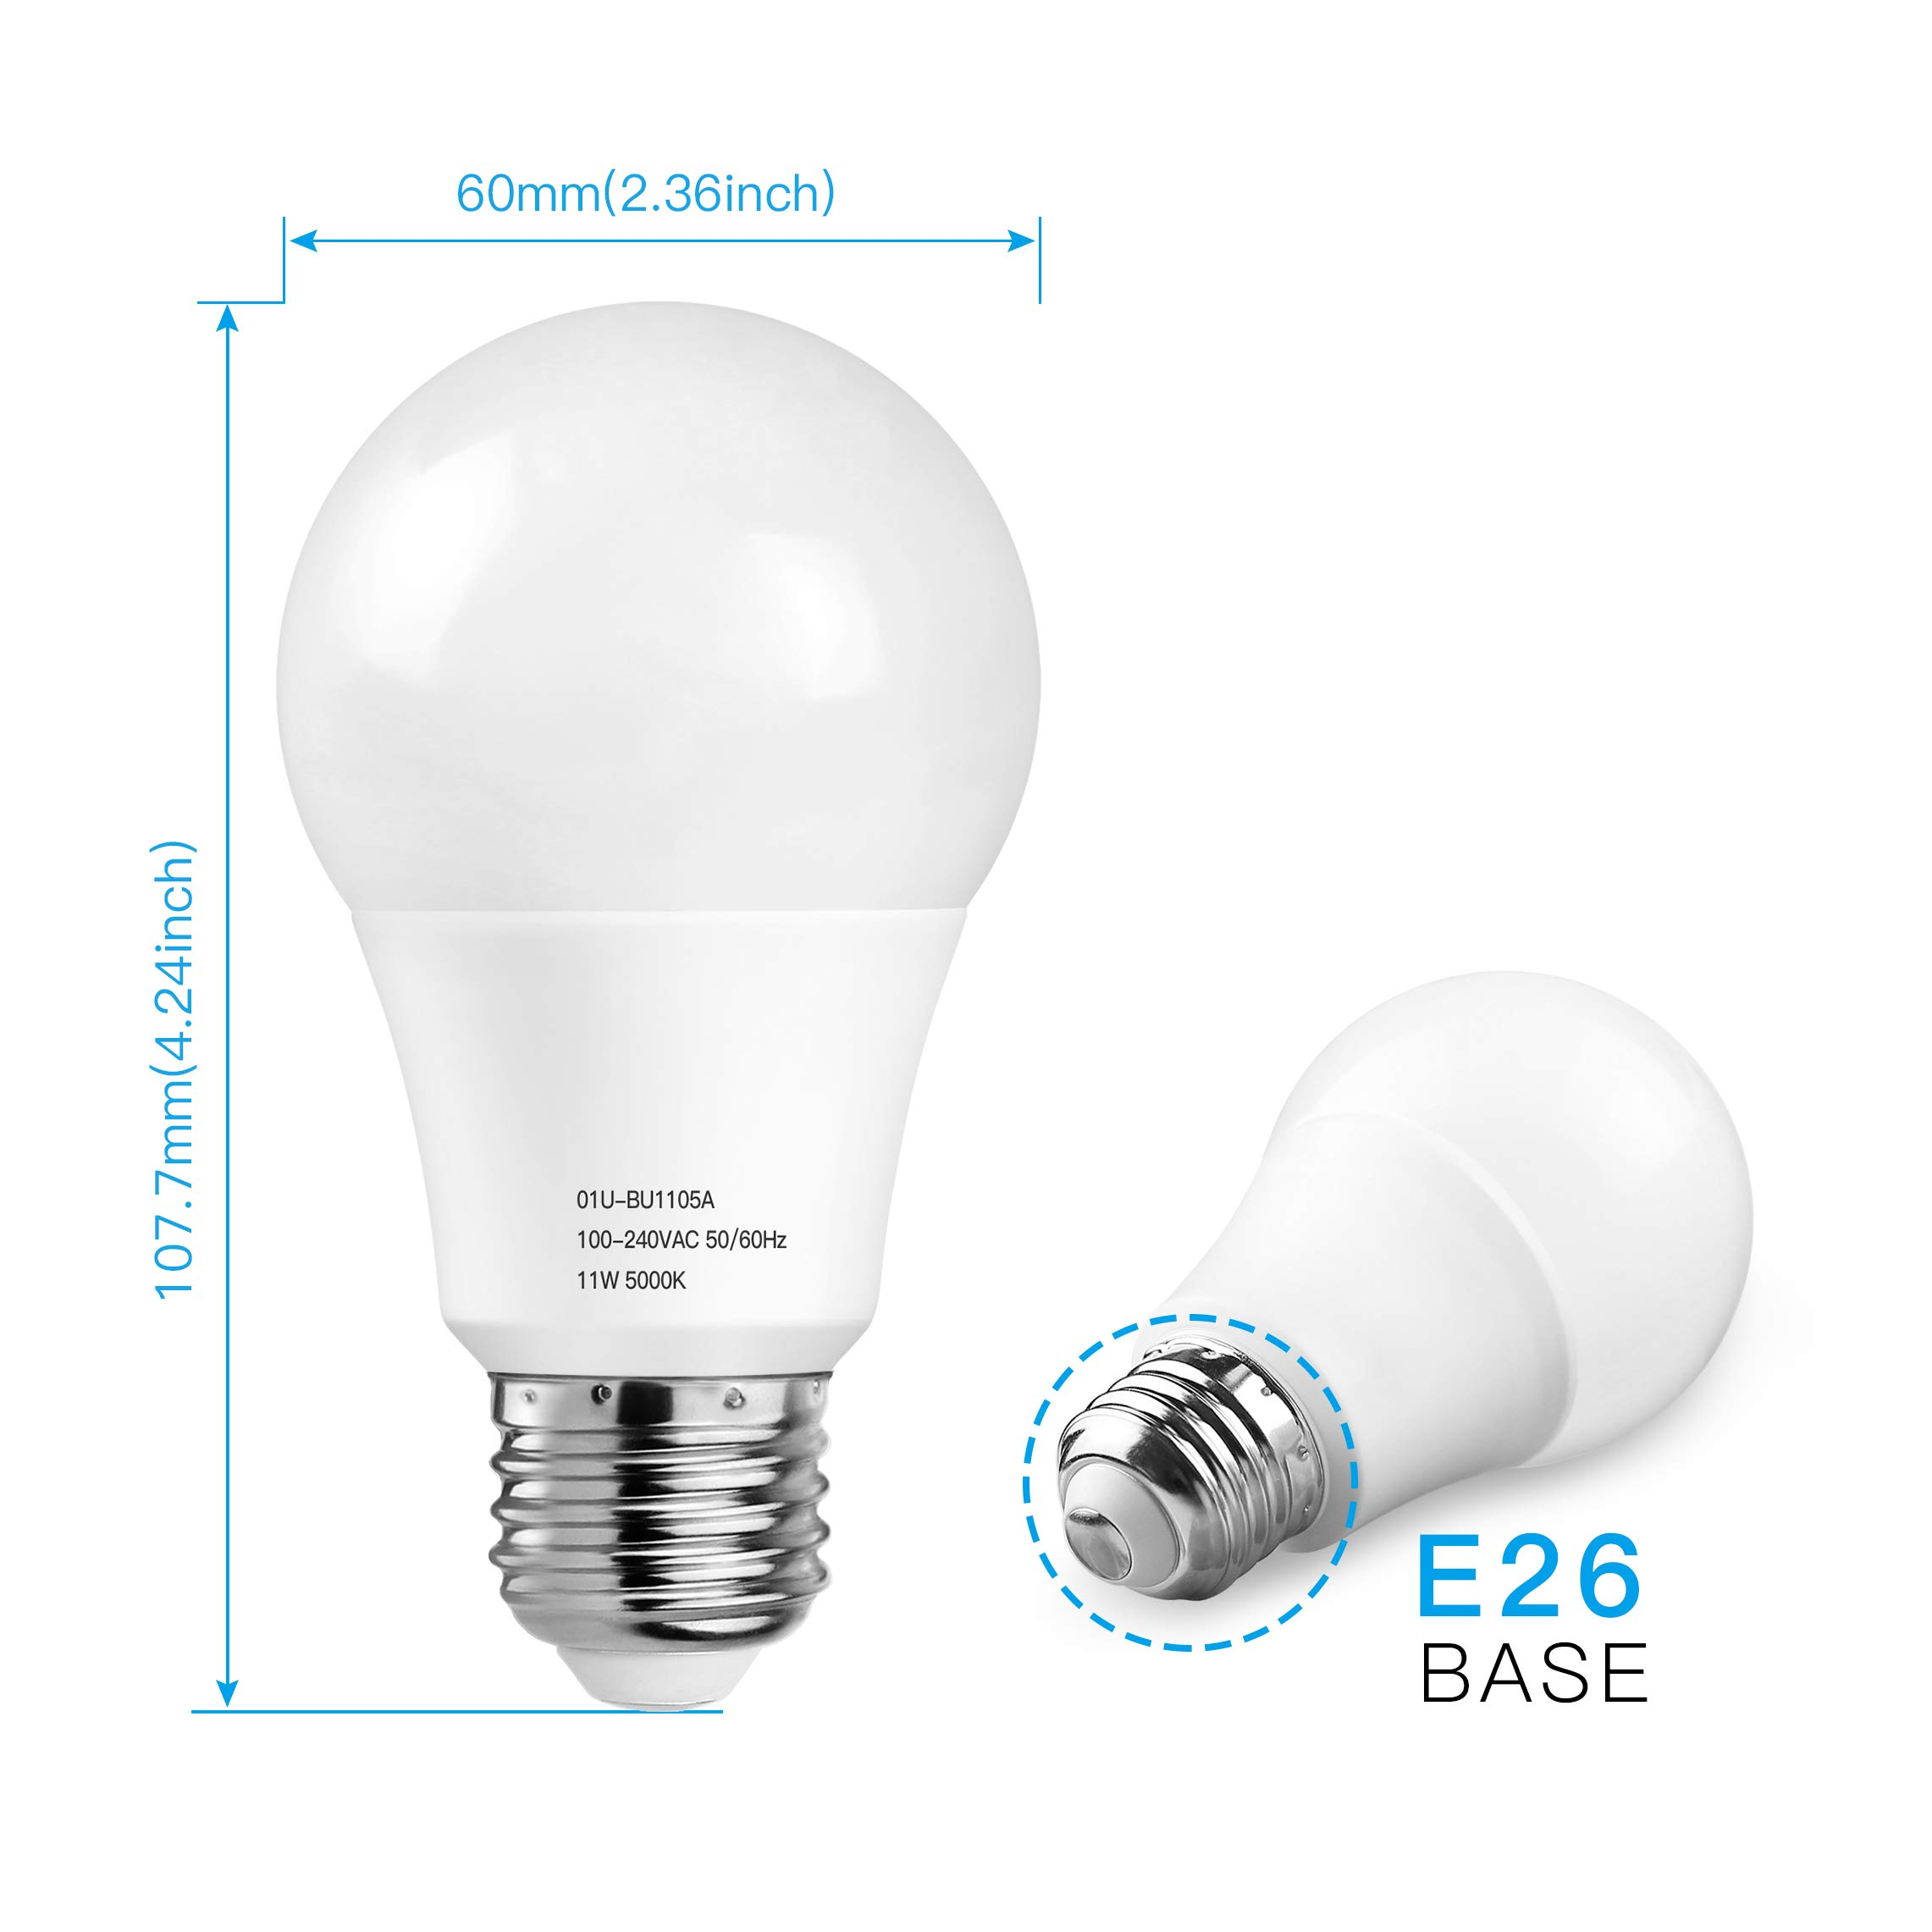 A19 LED Light Bulbs 5000K, 100 Watt Equivalent LED Bulb Daylight White, 1100Lumens, Non Dimmable, Medium Screw Base (E26), CRI80+, 12-Pack by MAXvolador (Image #4)